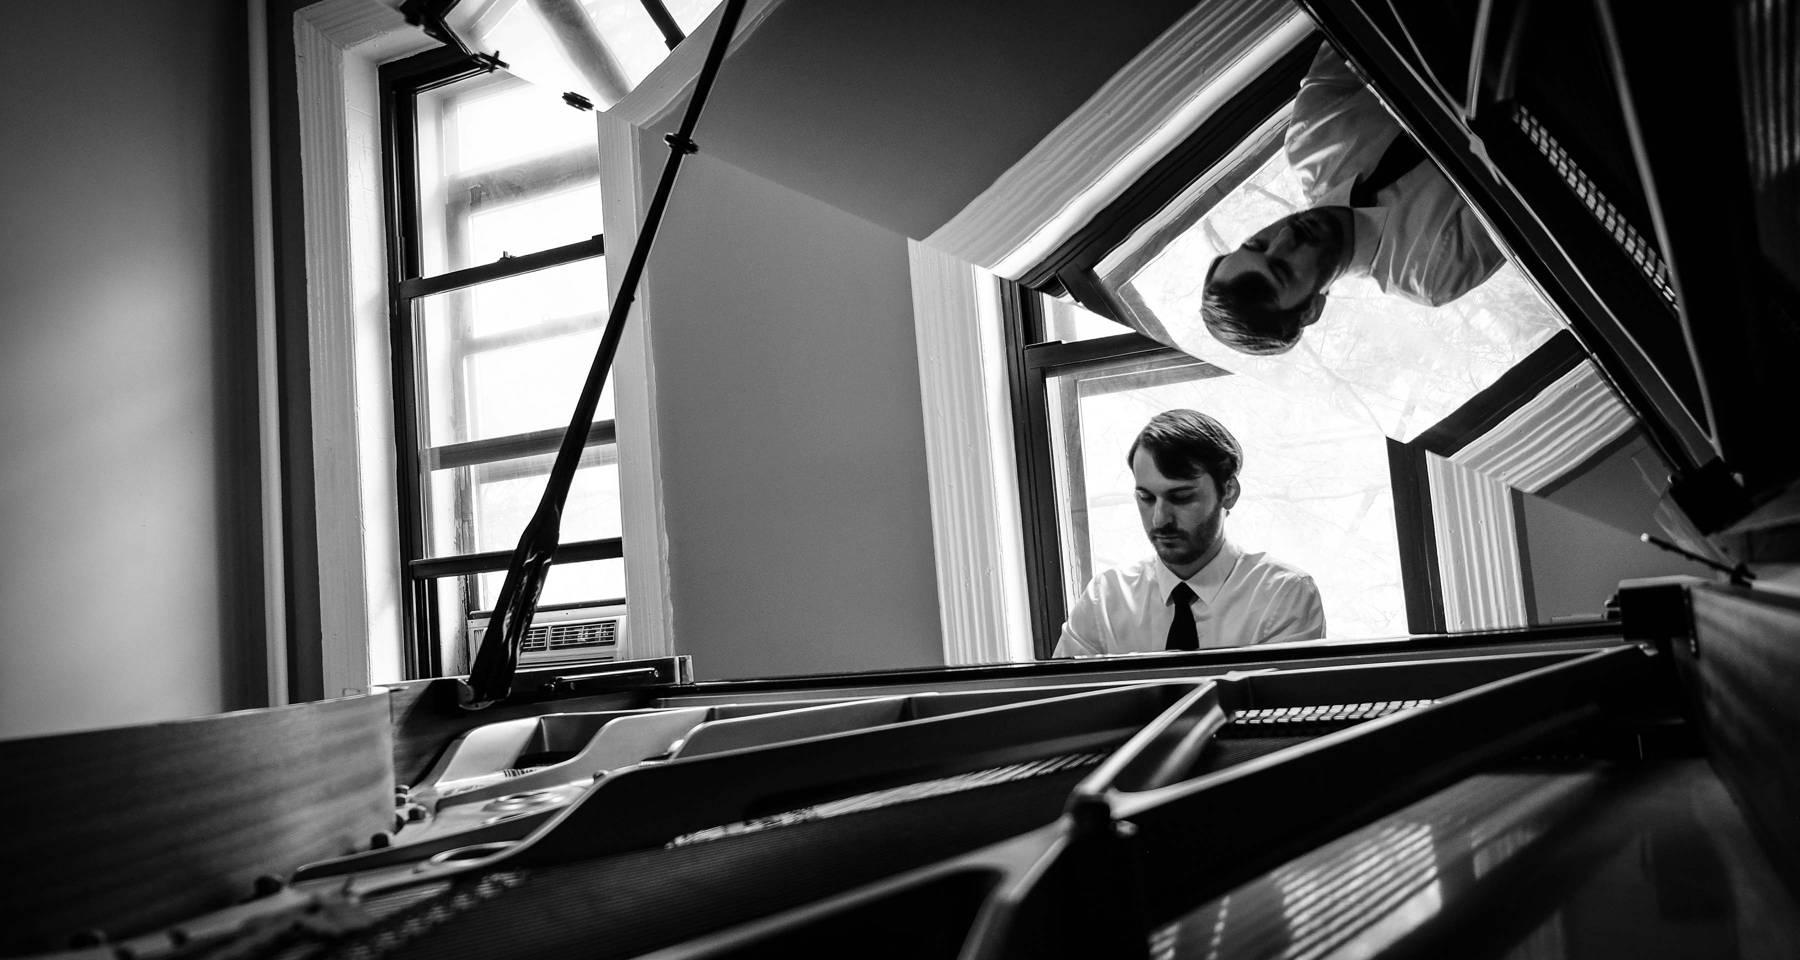 Piano recital by Daniel Colalillo at Clare Posnack's house. It's time!